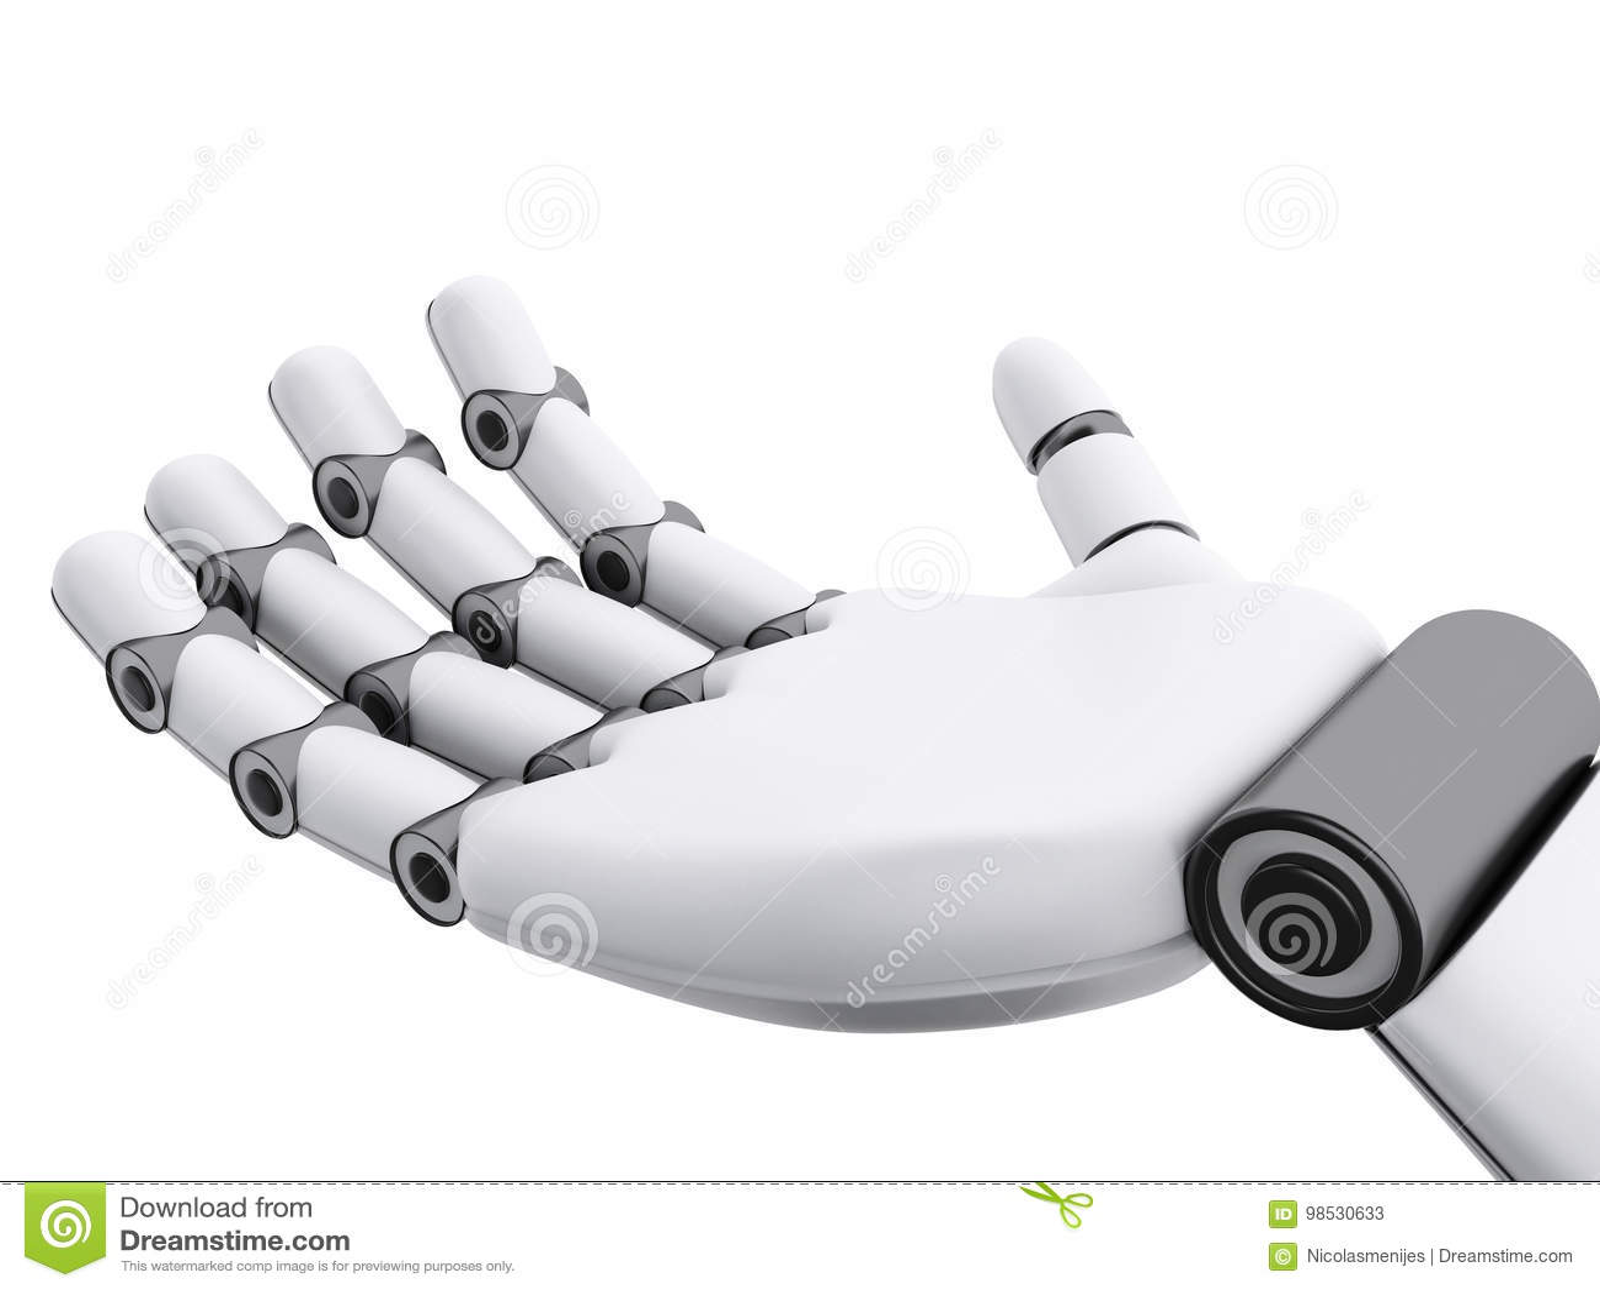 3d illustration. Robotic hand showing something